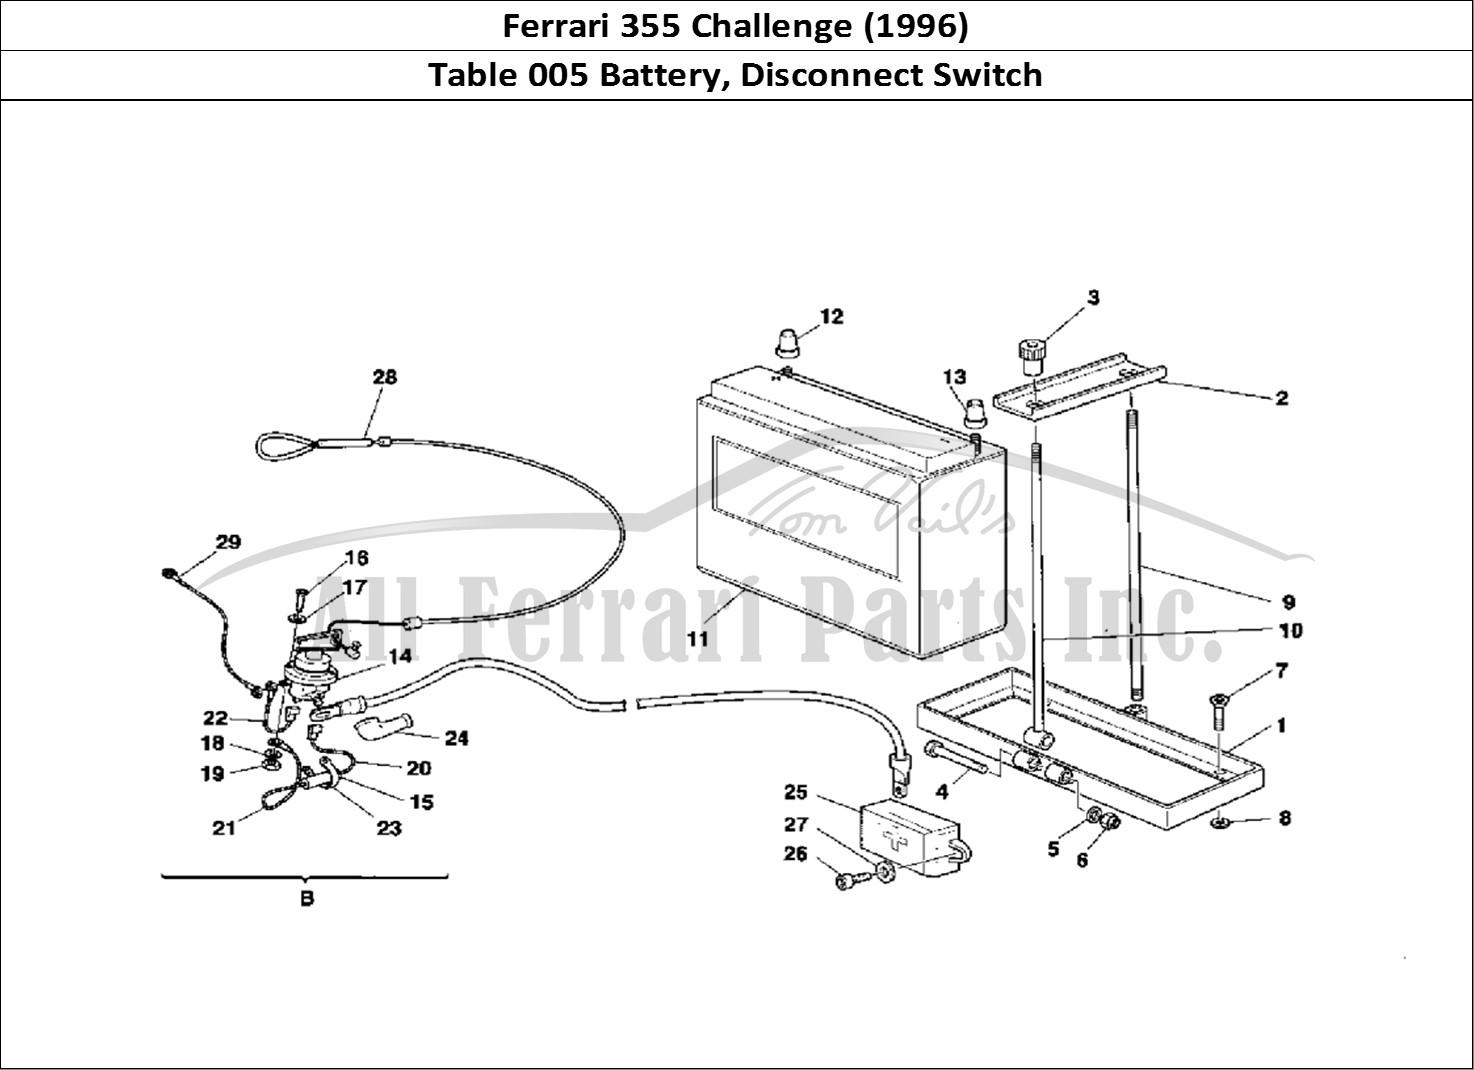 Buy original Ferrari 355 Challenge (1996) 005 Battery